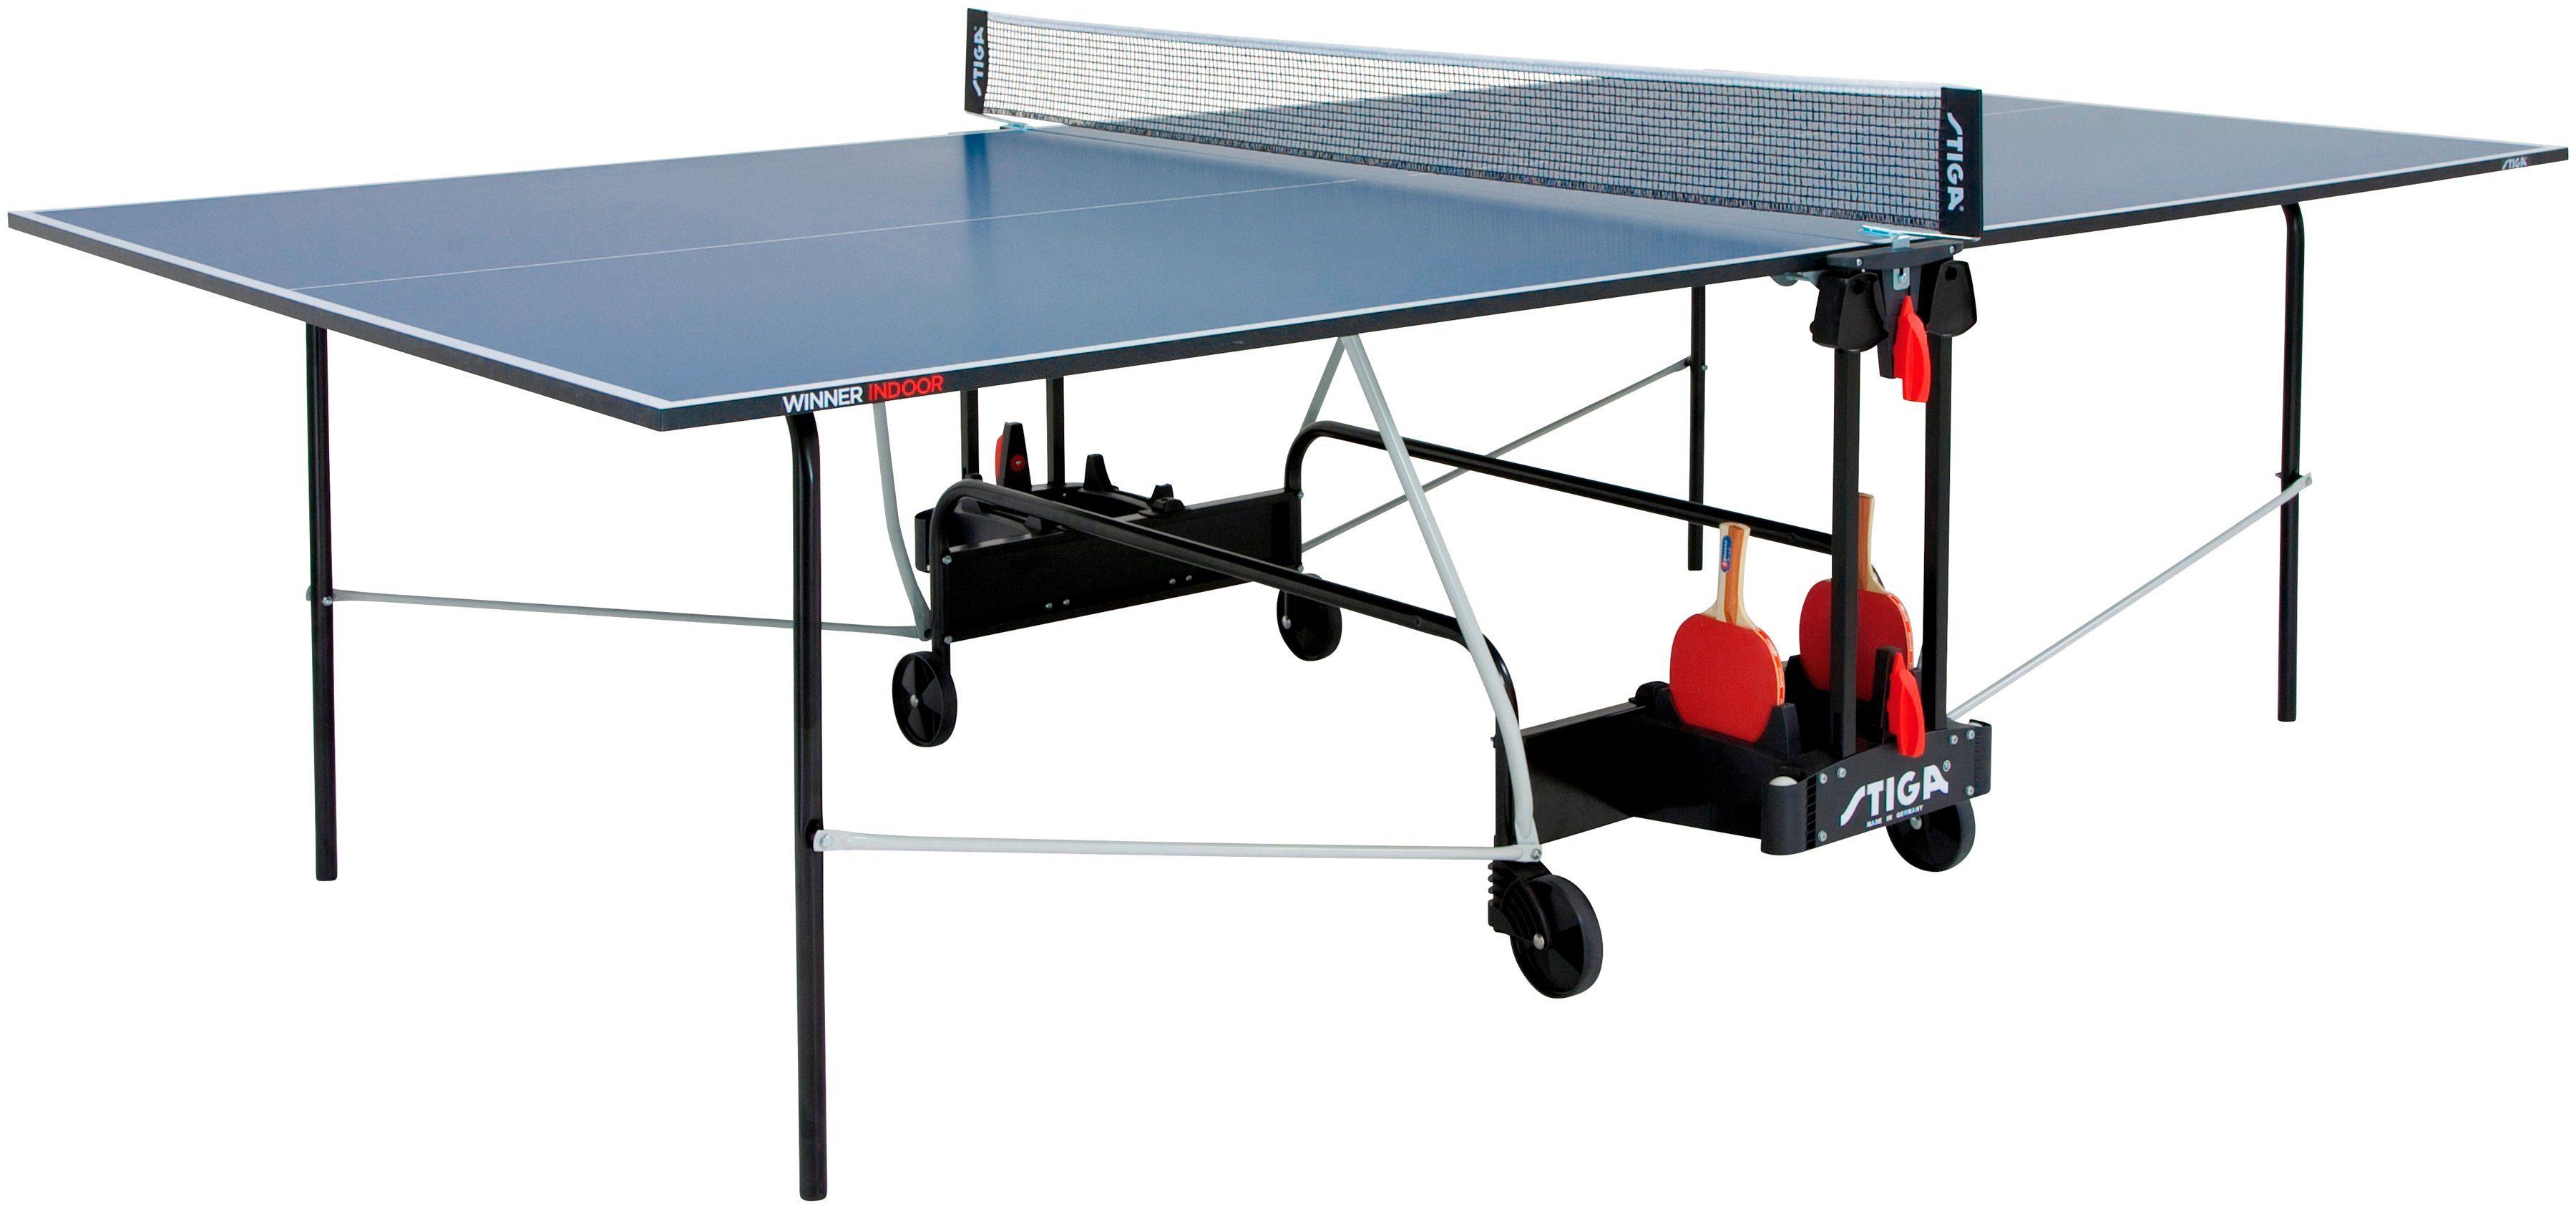 STIGA Tischtennisplatte »Winner Indoor«, BxLxH: 152,5x274x76 cm